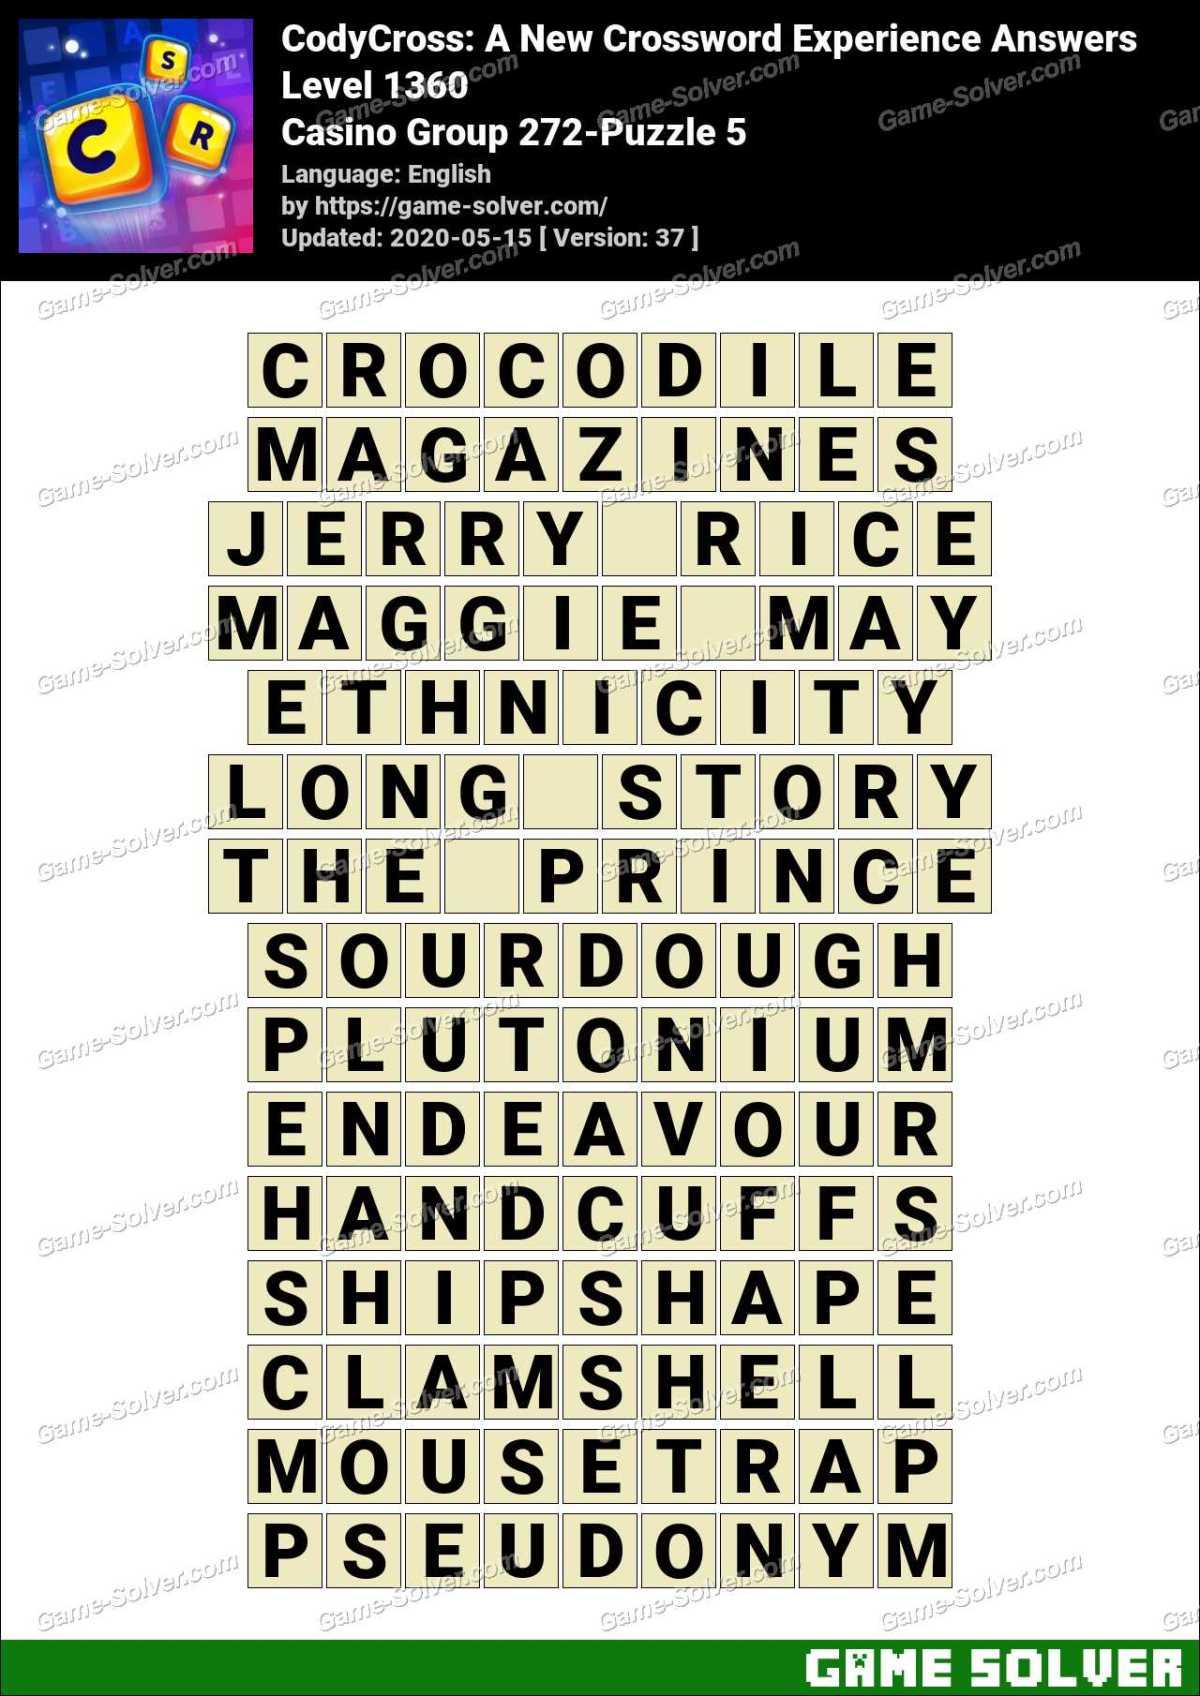 CodyCross Casino Group 272-Puzzle 5 Answers